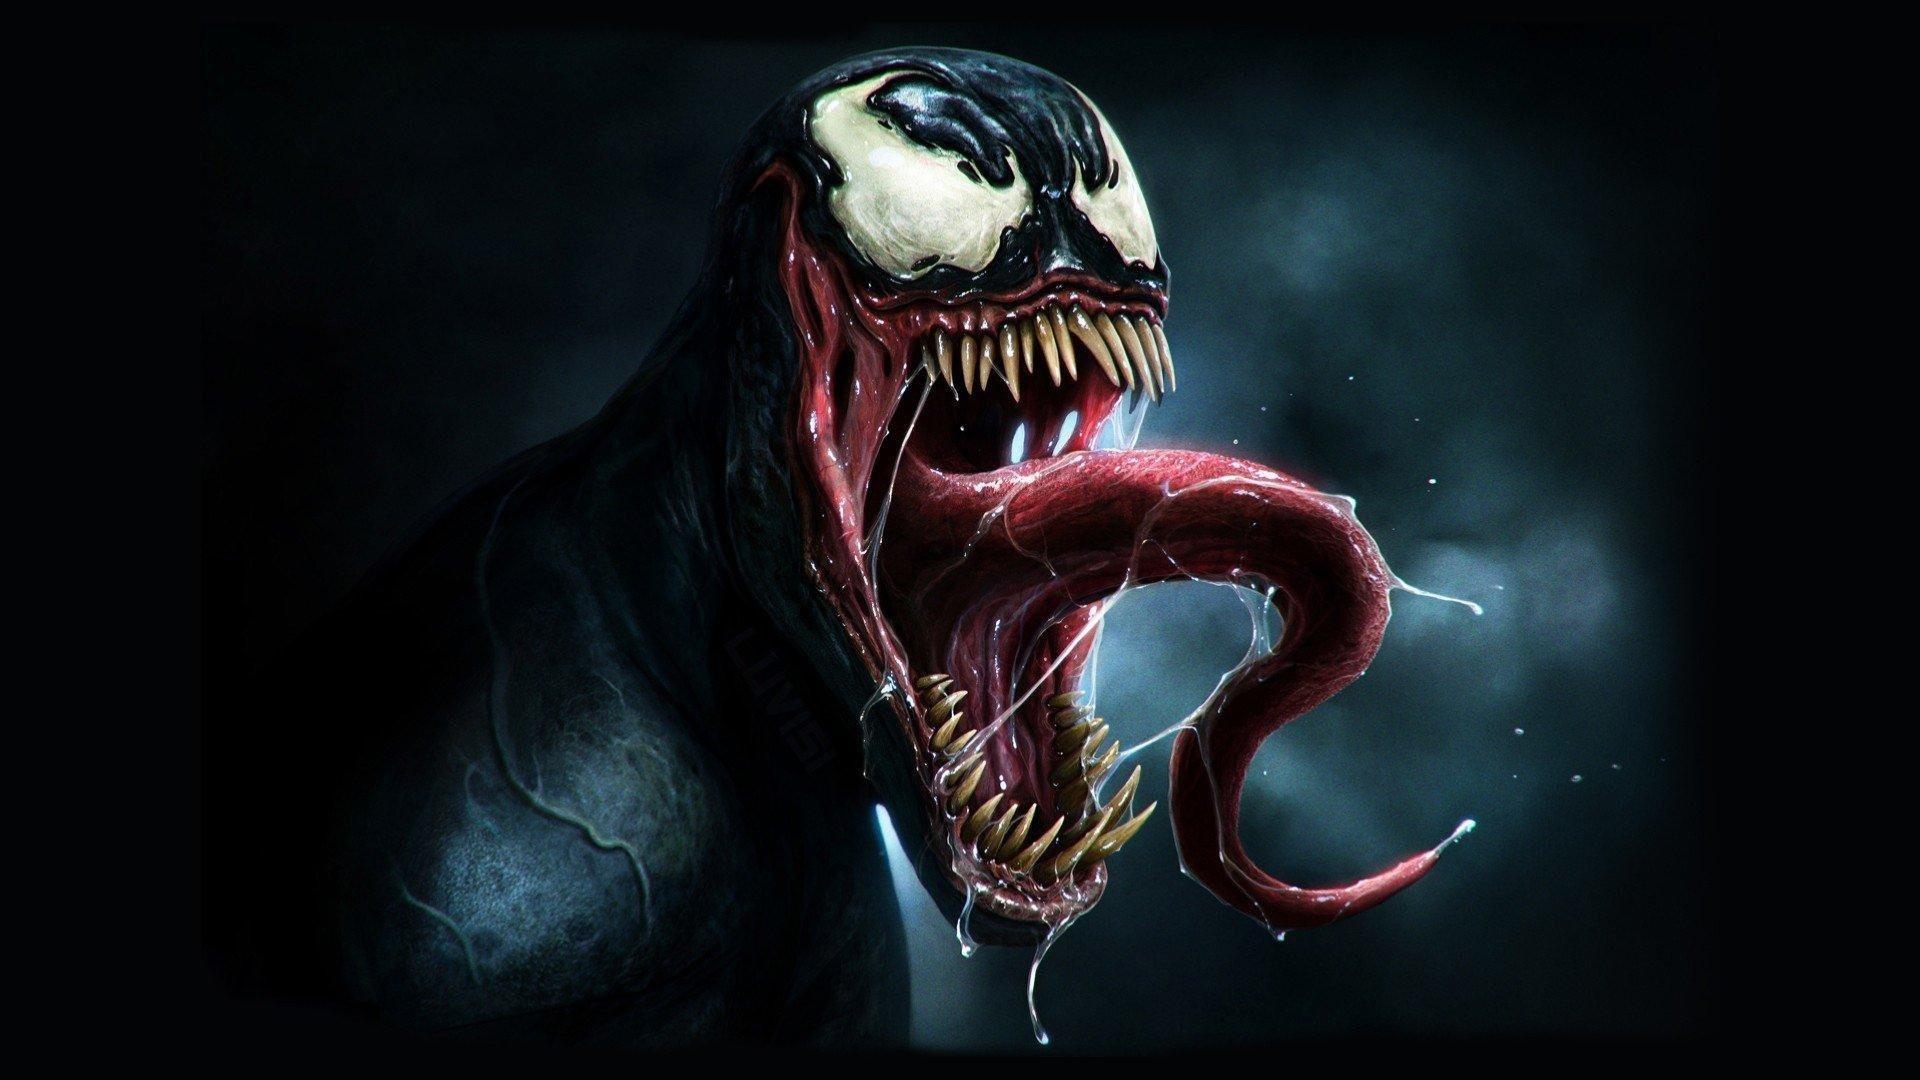 Res: 1920x1080, Venom Tongue Supervillain wallpaper available as Venom Tongue Supervillain  Android wallpaper, Venom Tongue Supervillain iPhone wallpaper and high  definition ...